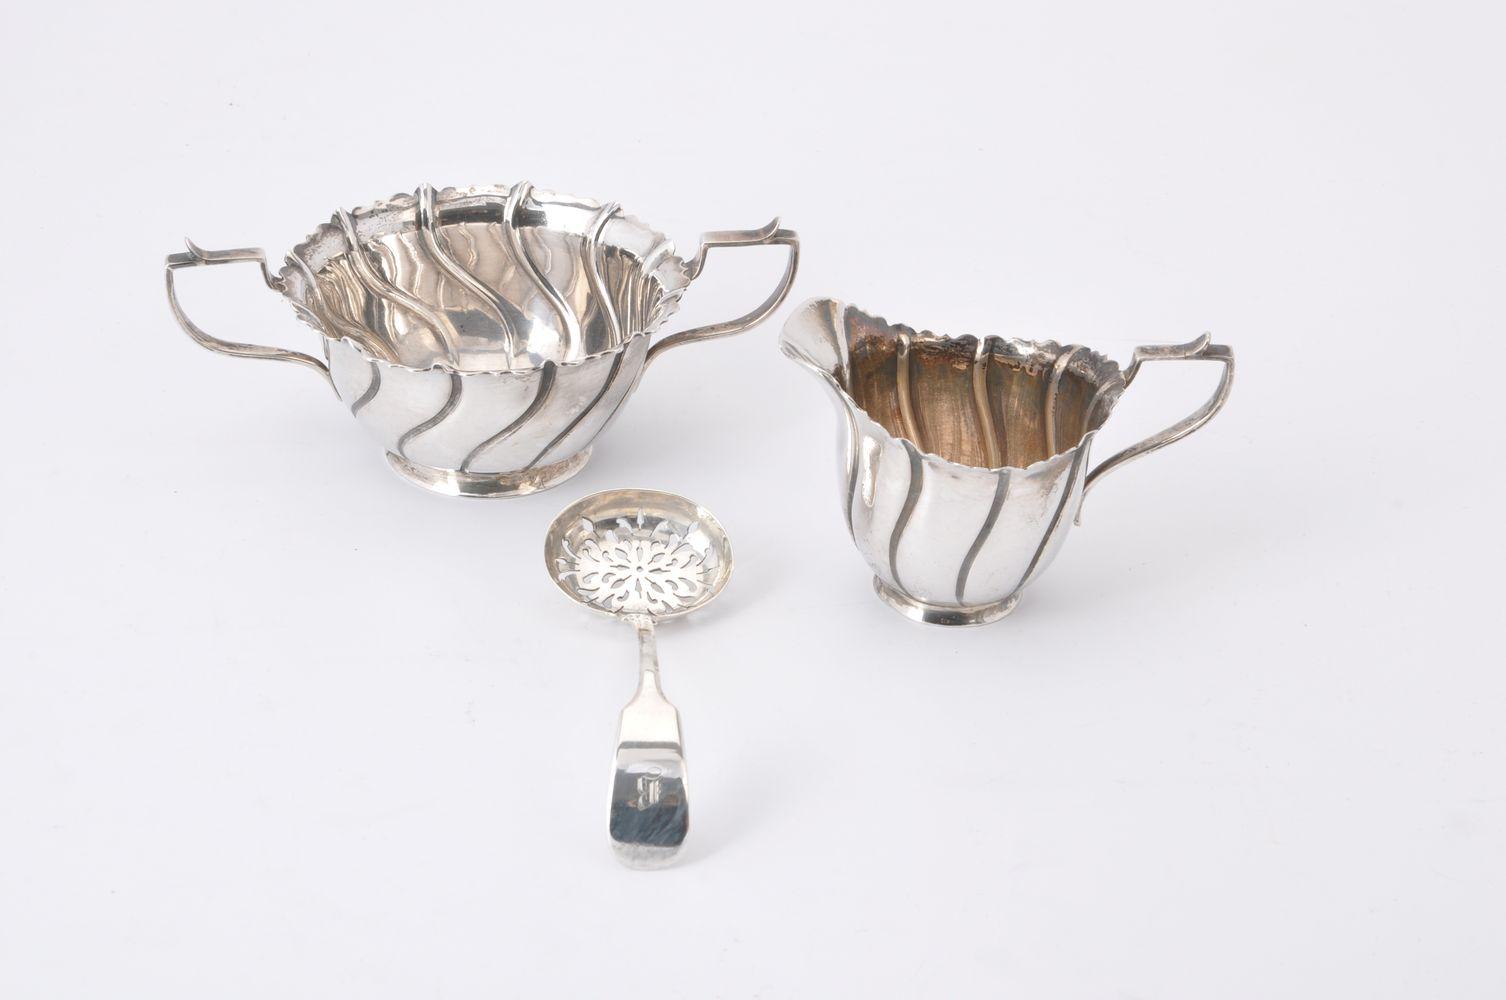 A late Victorian Irish silver sugar bowl and milk jug by The Goldsmiths & Silversmiths Co. Ltd